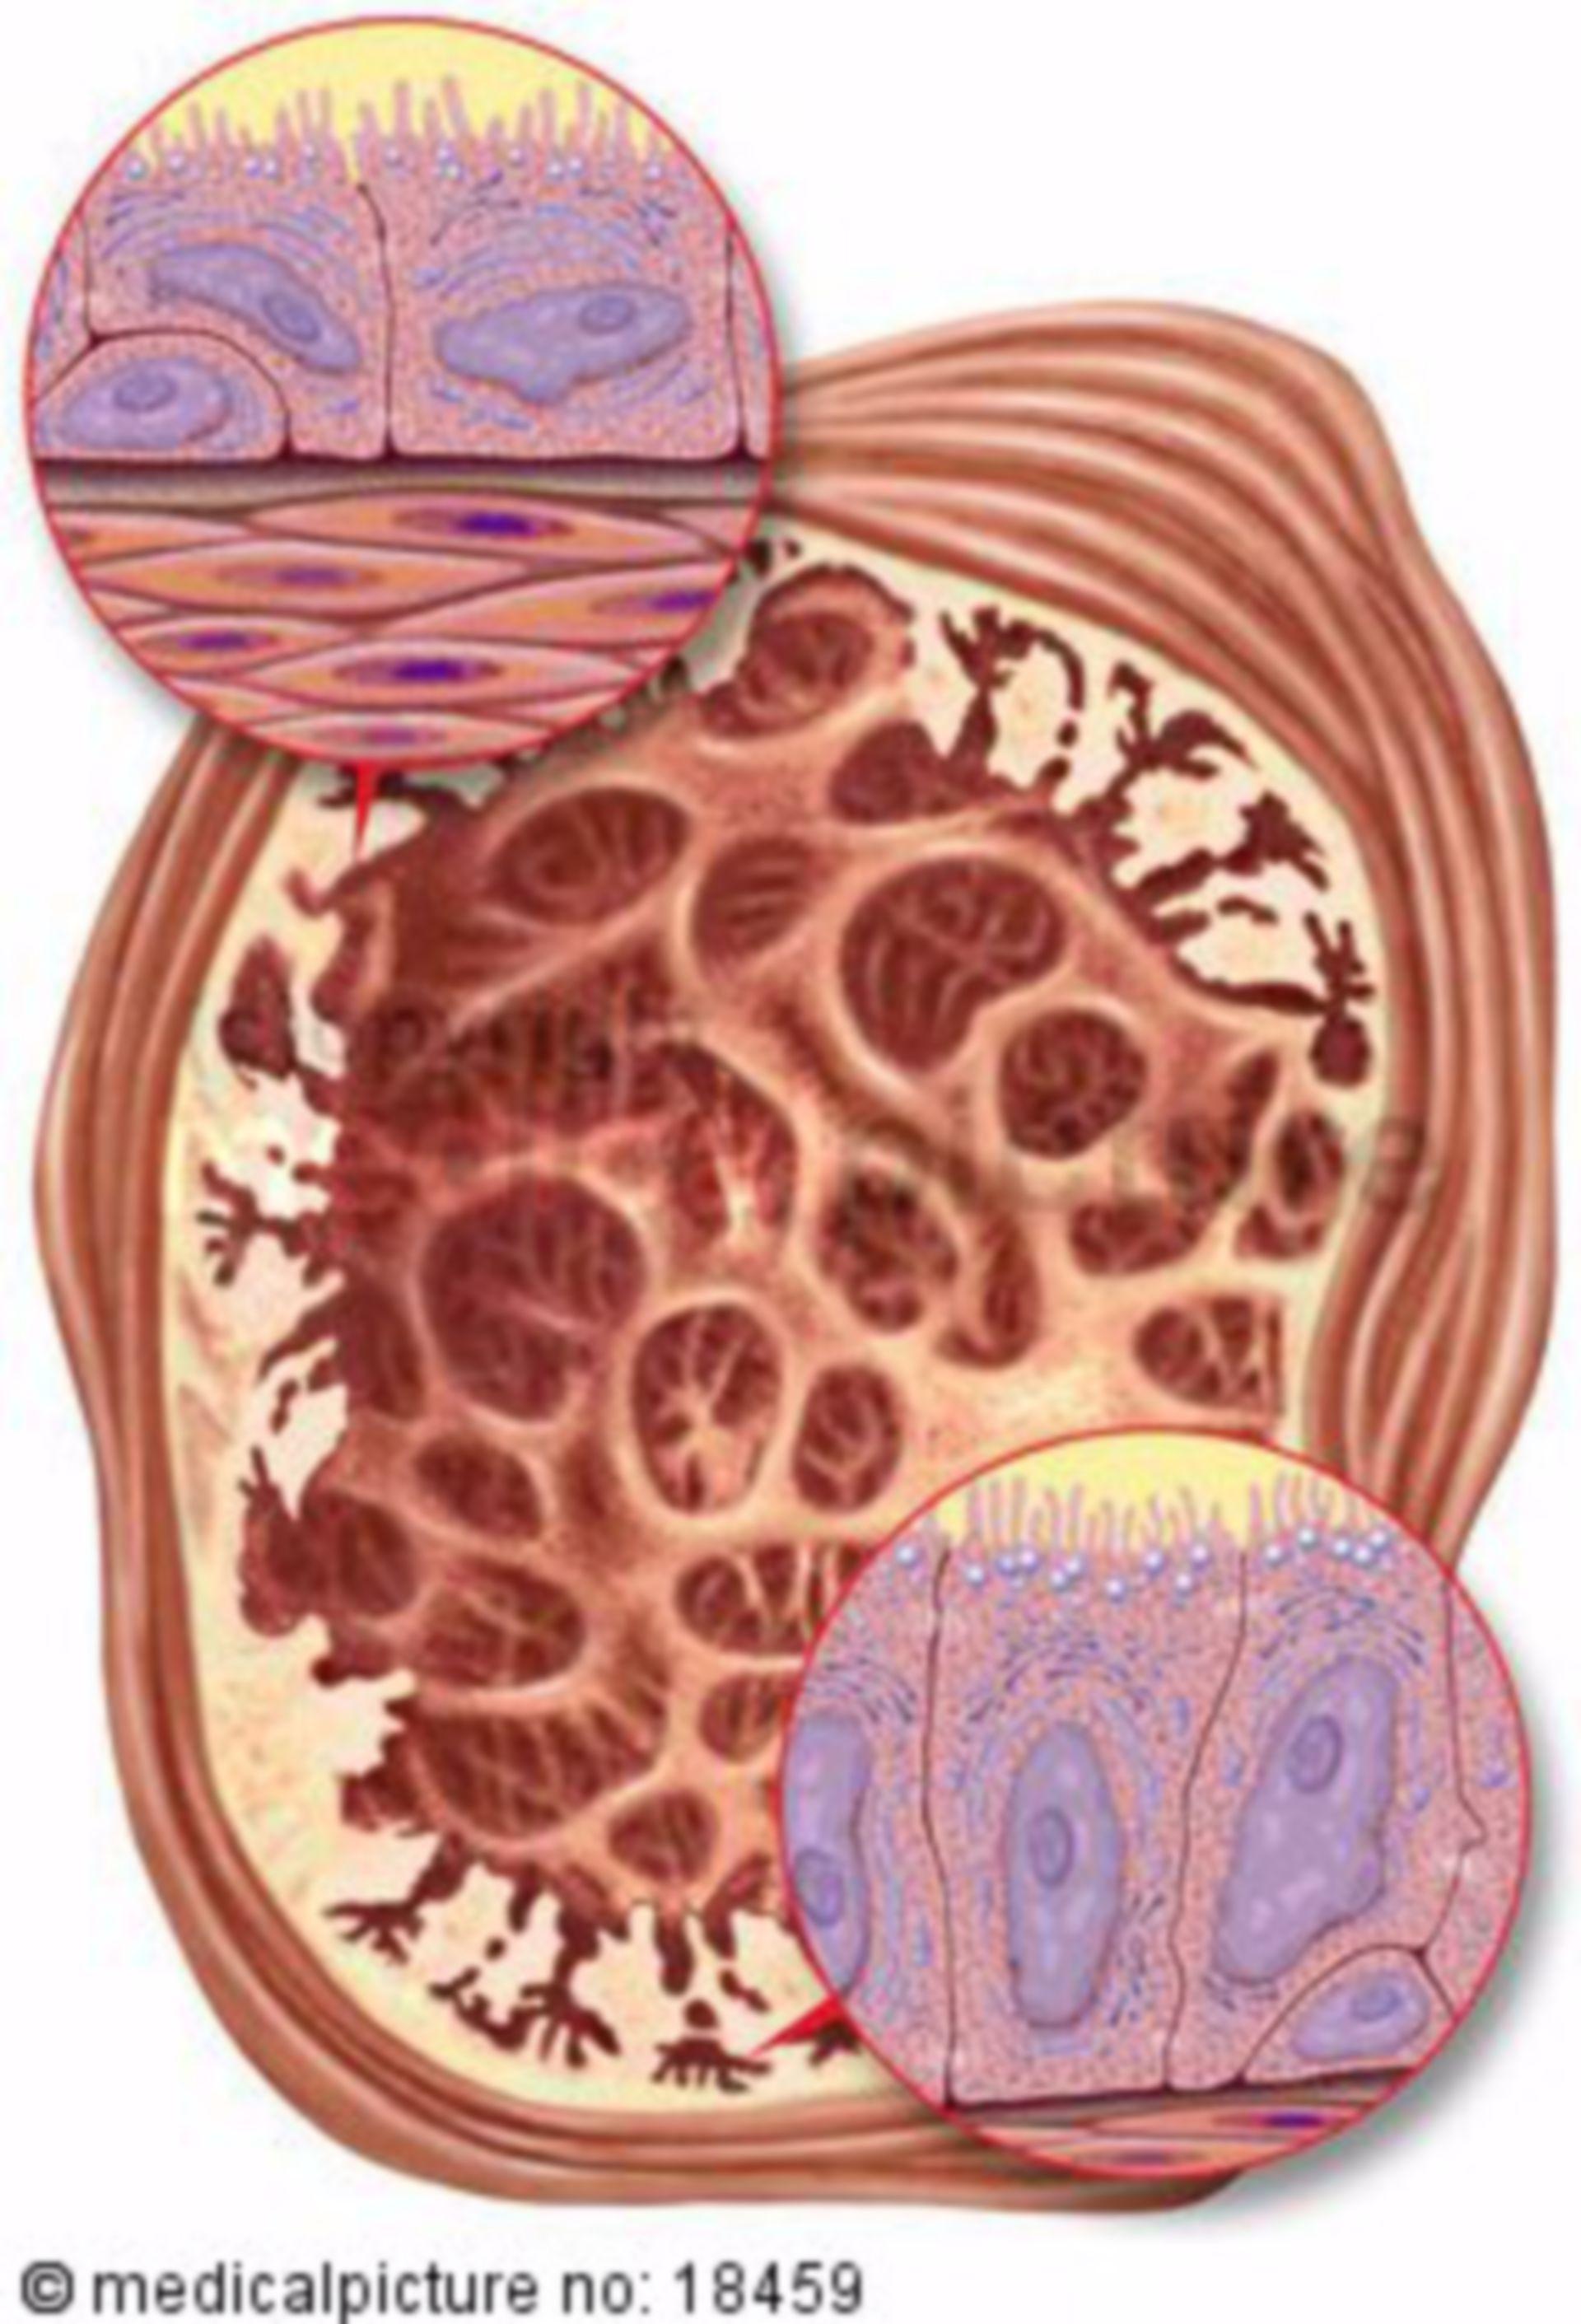 Cross-section and glandular epithelium of the seminal vesicle